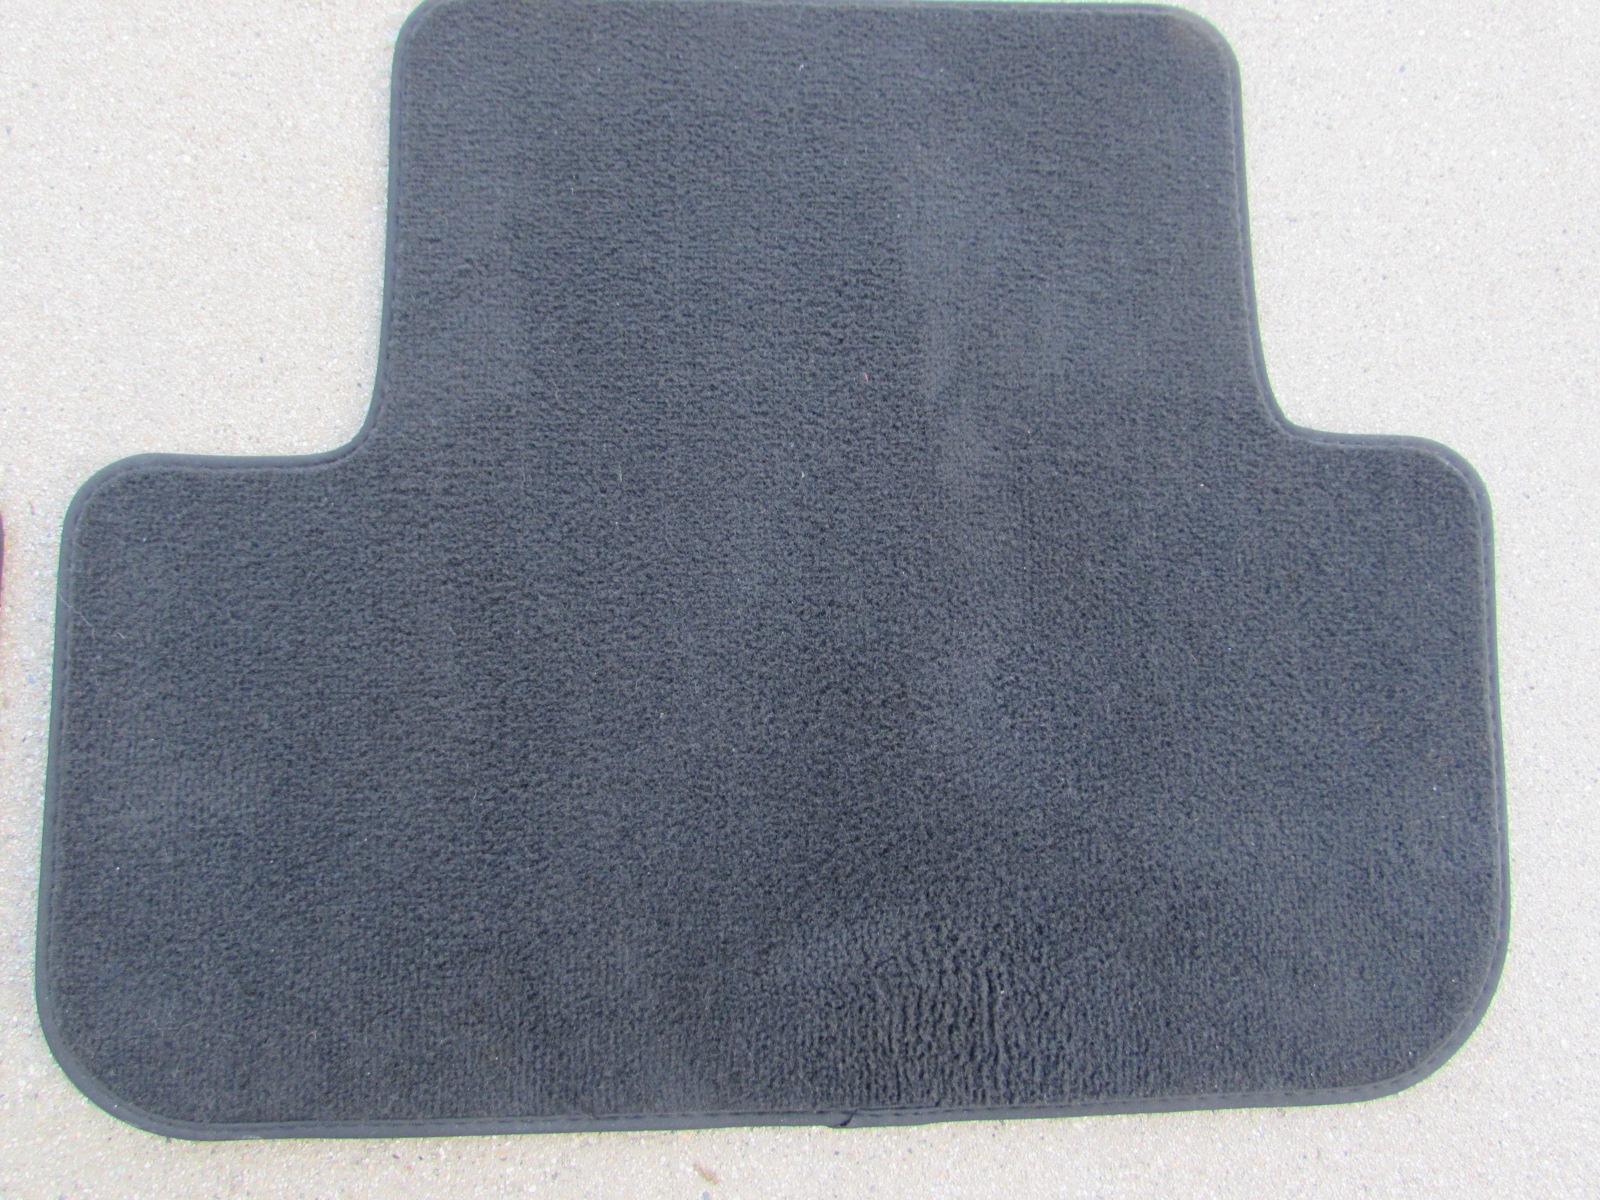 installed mats p mat tan jeep logo floor series utility quadratec plasticolor floors rear elite